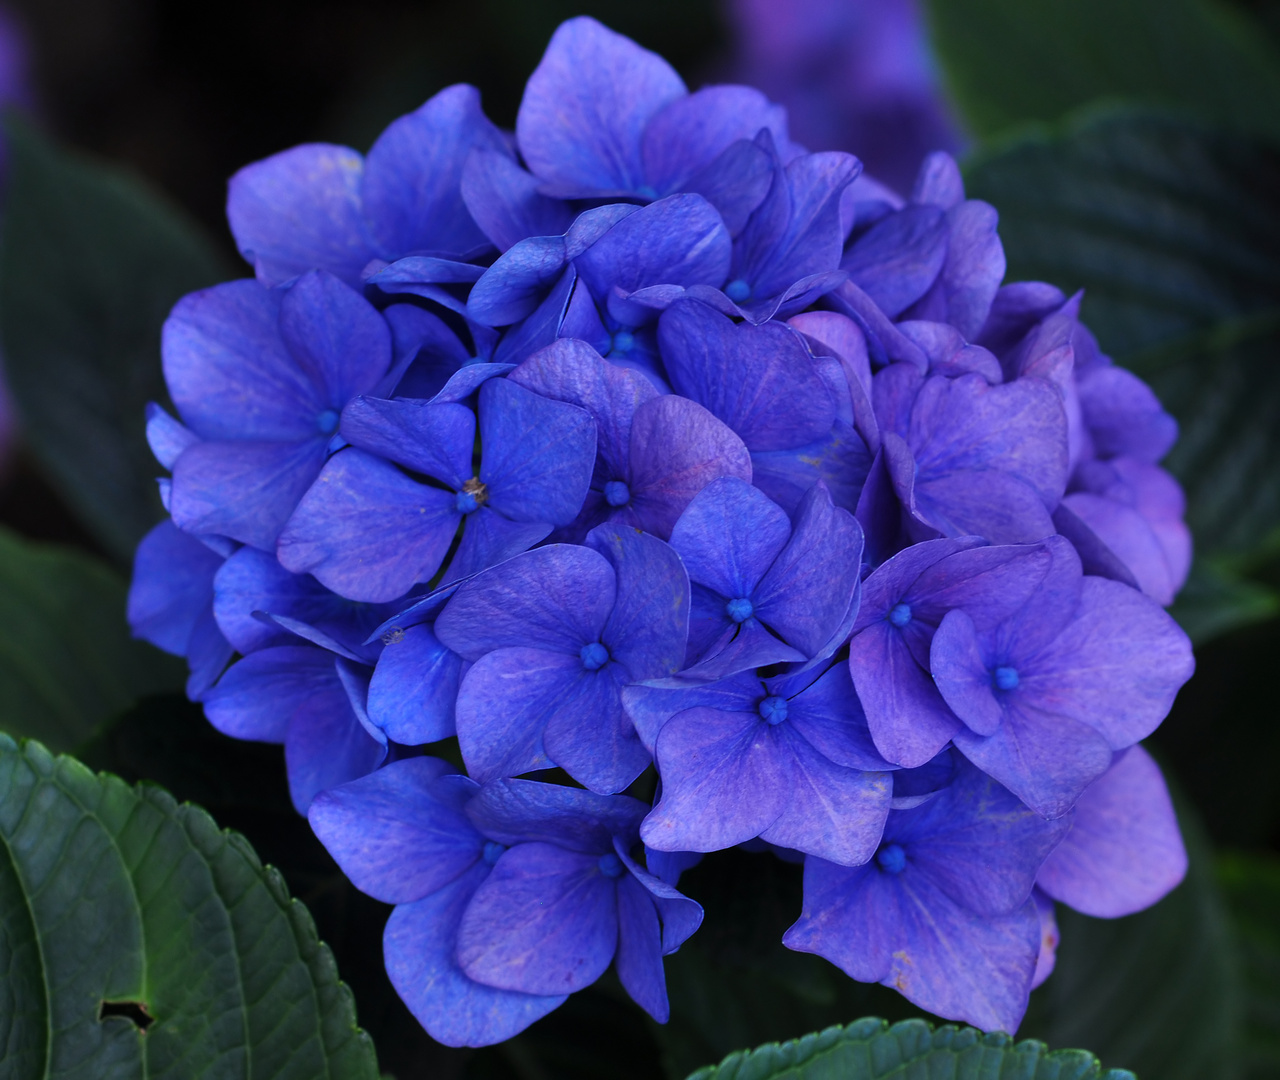 blaue hortensie foto bild pflanzen pilze flechten bl ten kleinpflanzen. Black Bedroom Furniture Sets. Home Design Ideas